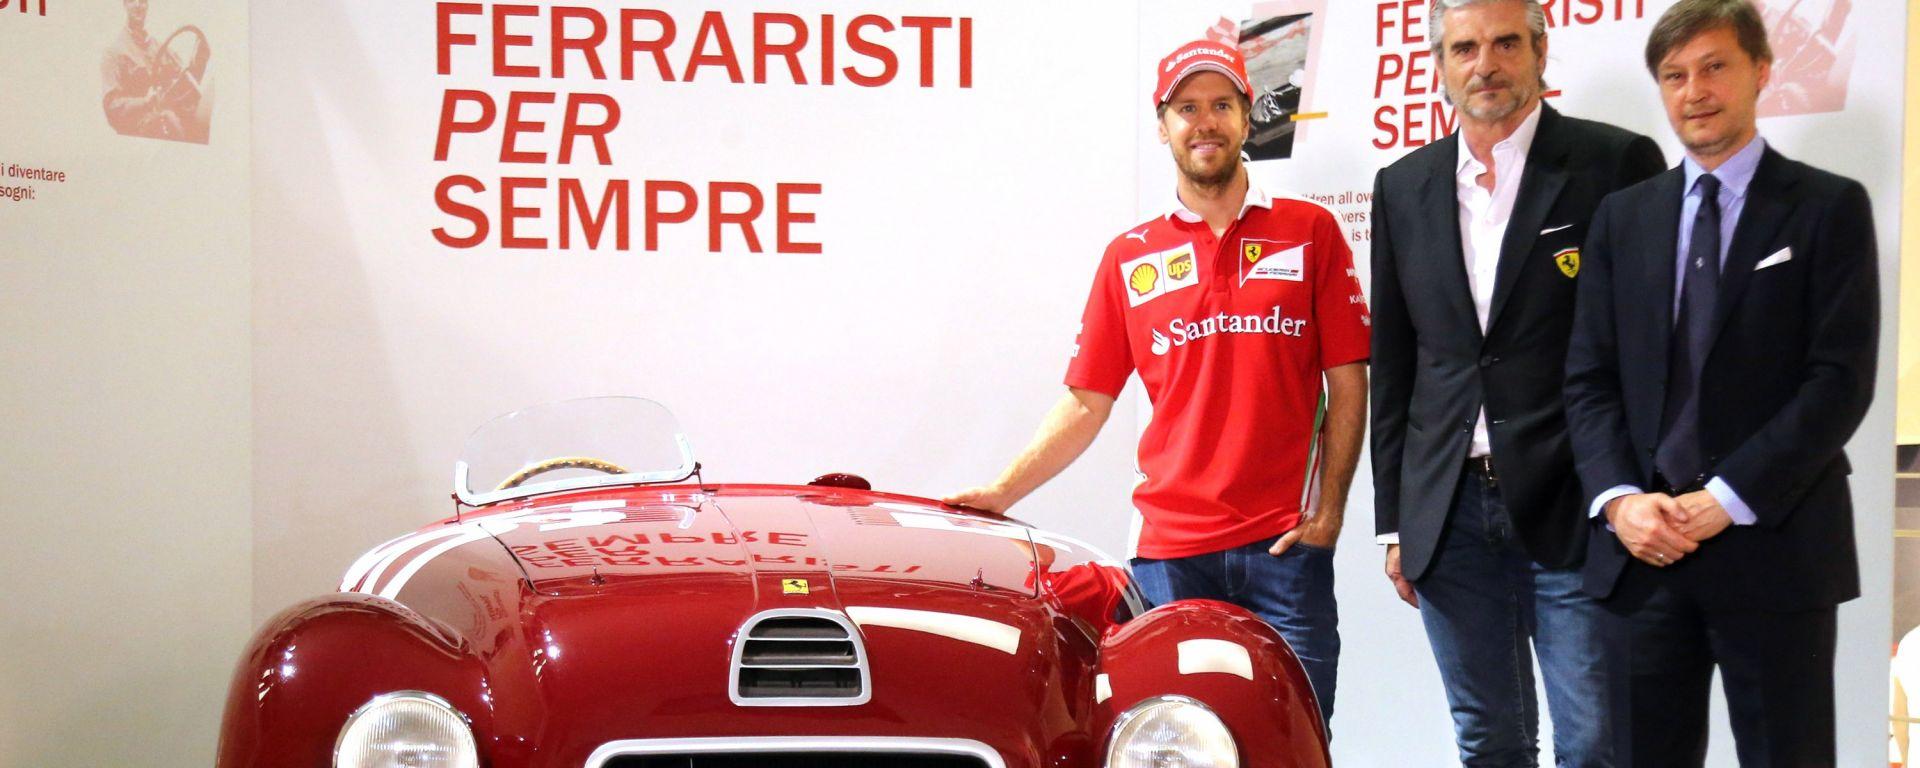 Ferrari: Sebastian Vettel alla mostra Ferraristi per Sempre